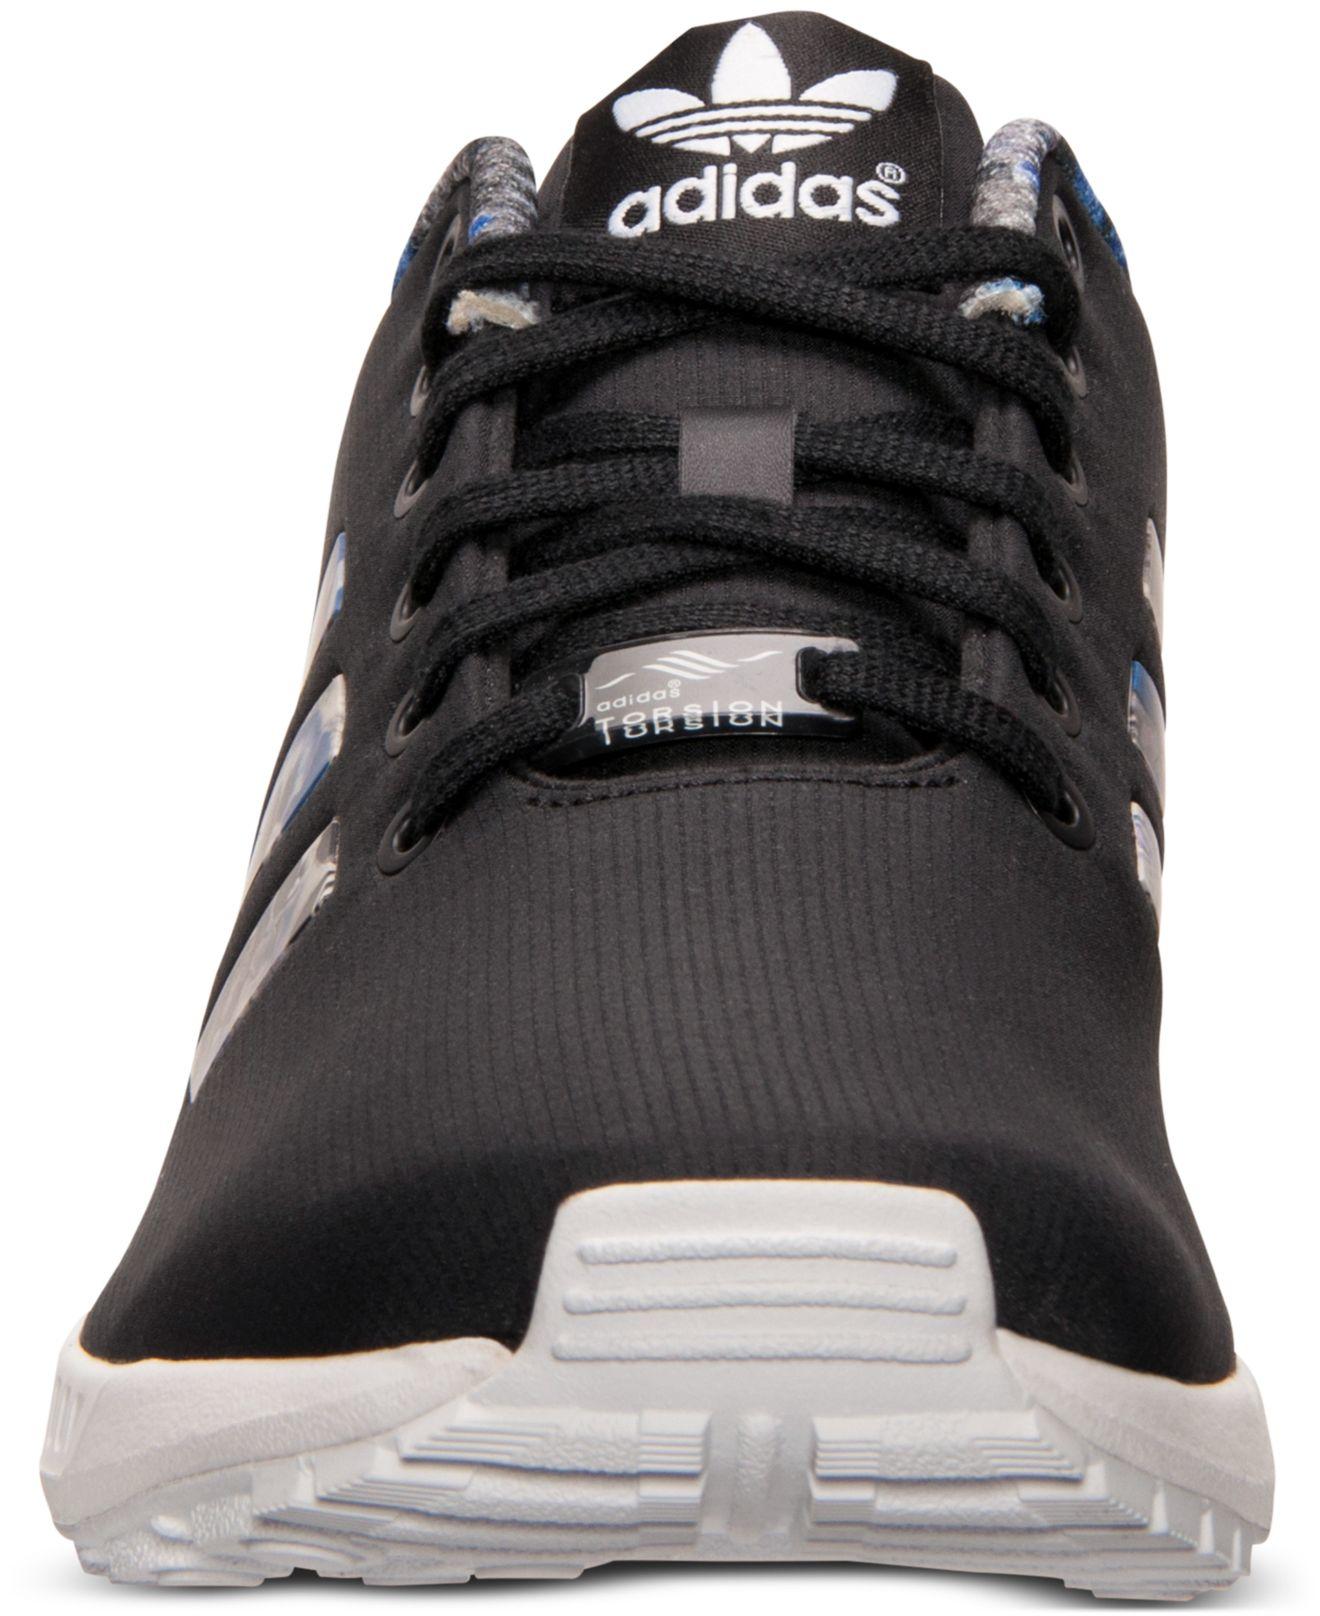 1aafa146c6f79 cheapest shoes black adidas adidas shoes running shoes print 920b8 9b0e1   coupon for adidas originals zx flux boys preschool gallery . 1c13f cd6e1